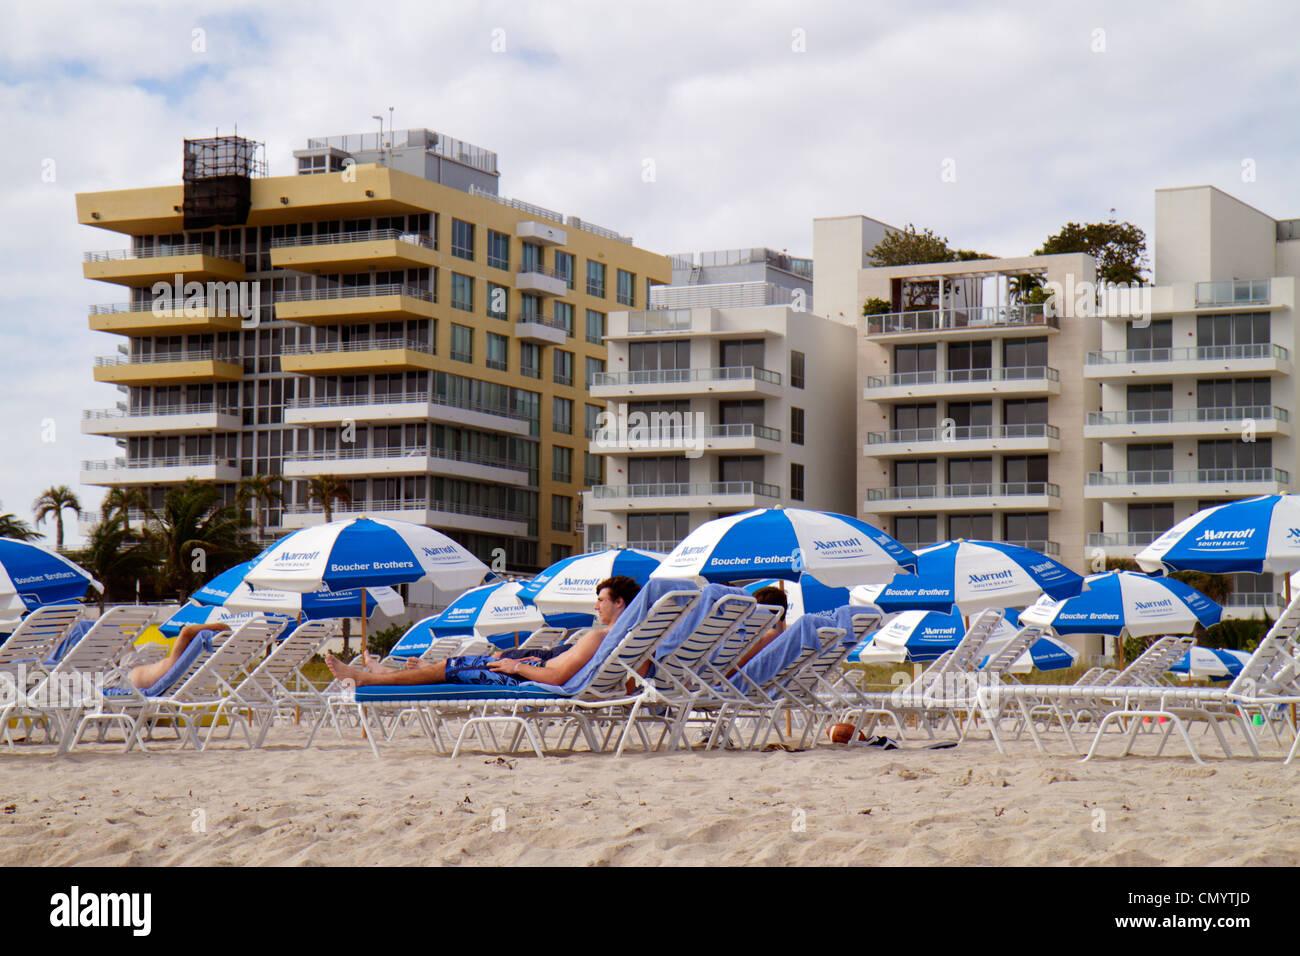 Miami Beach Florida rental lounge chairs condominium building man sunbathing public beach Stock Photo